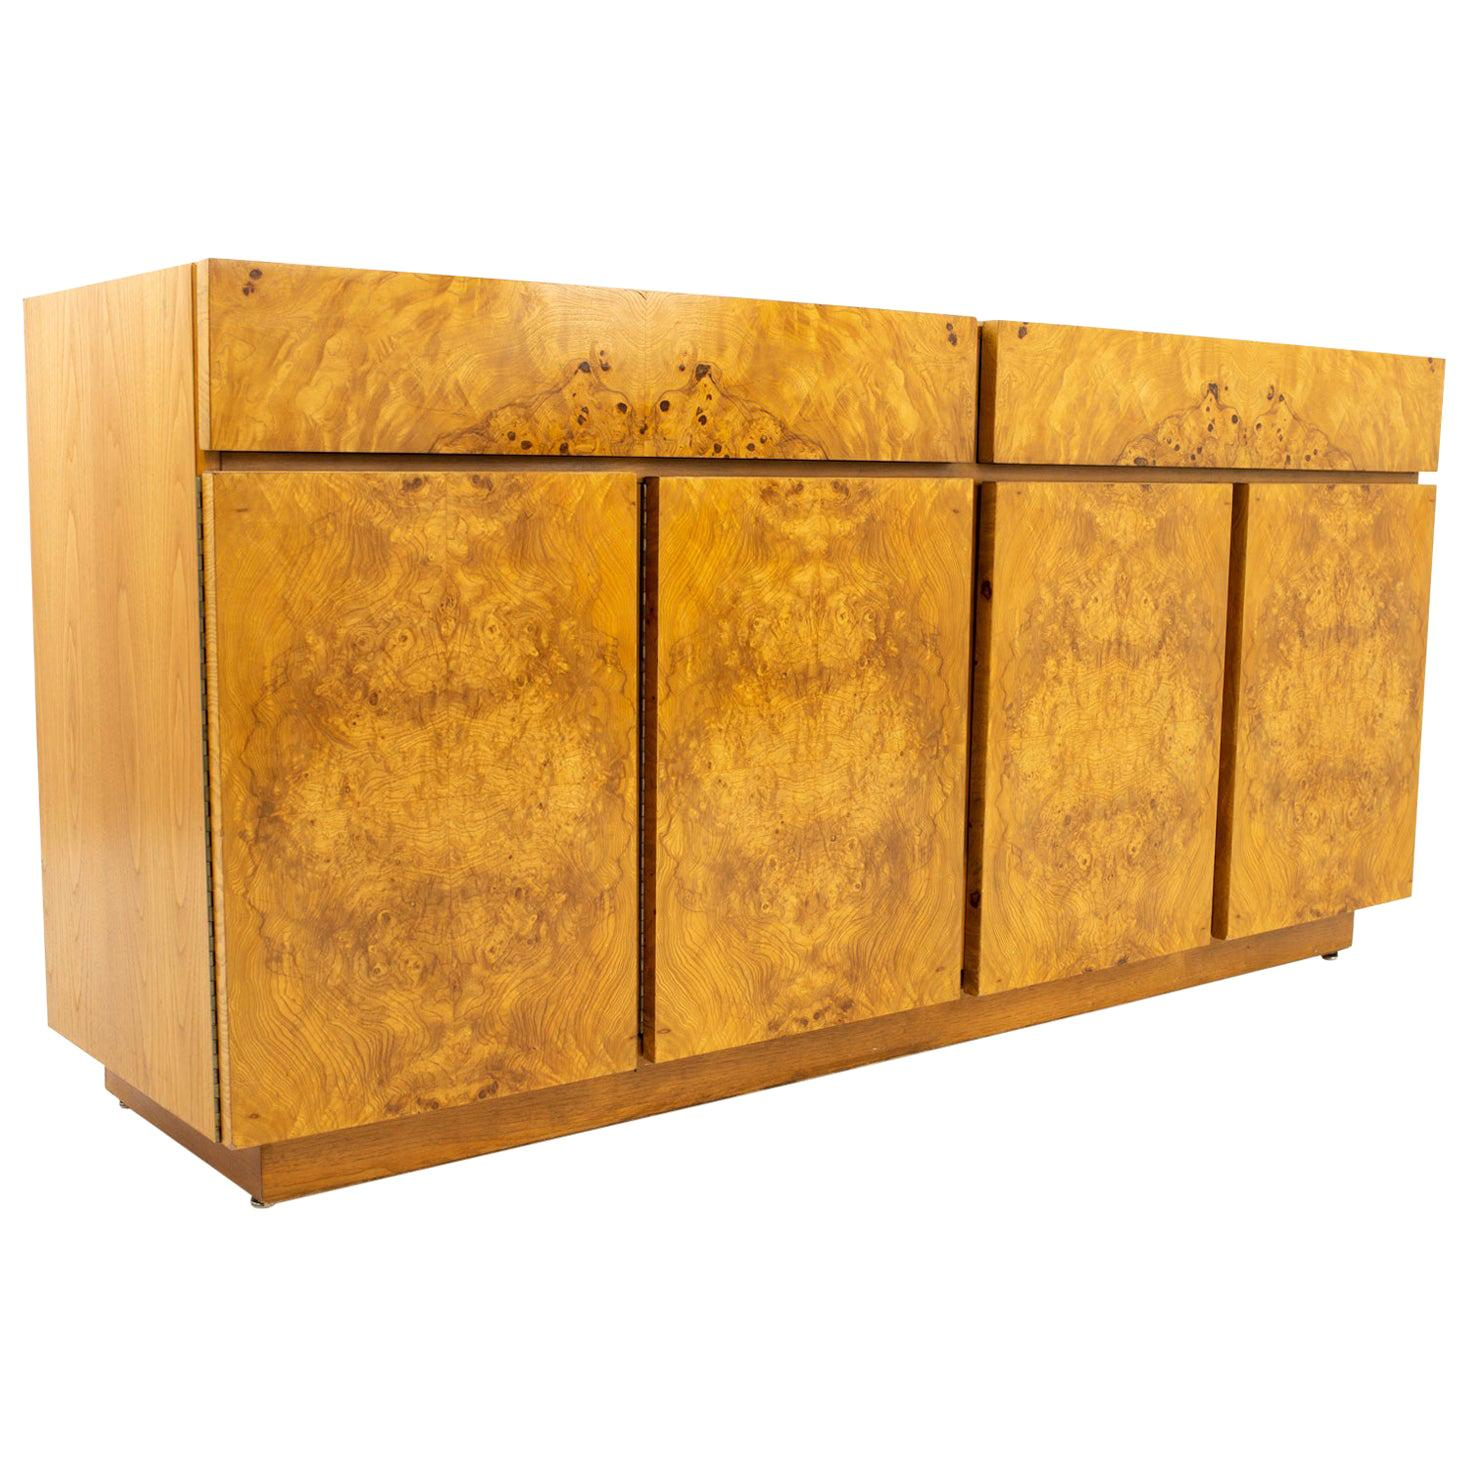 Milo Baughman Style Lane Midcentury Burl Wood and Oak Sideboard Credenza